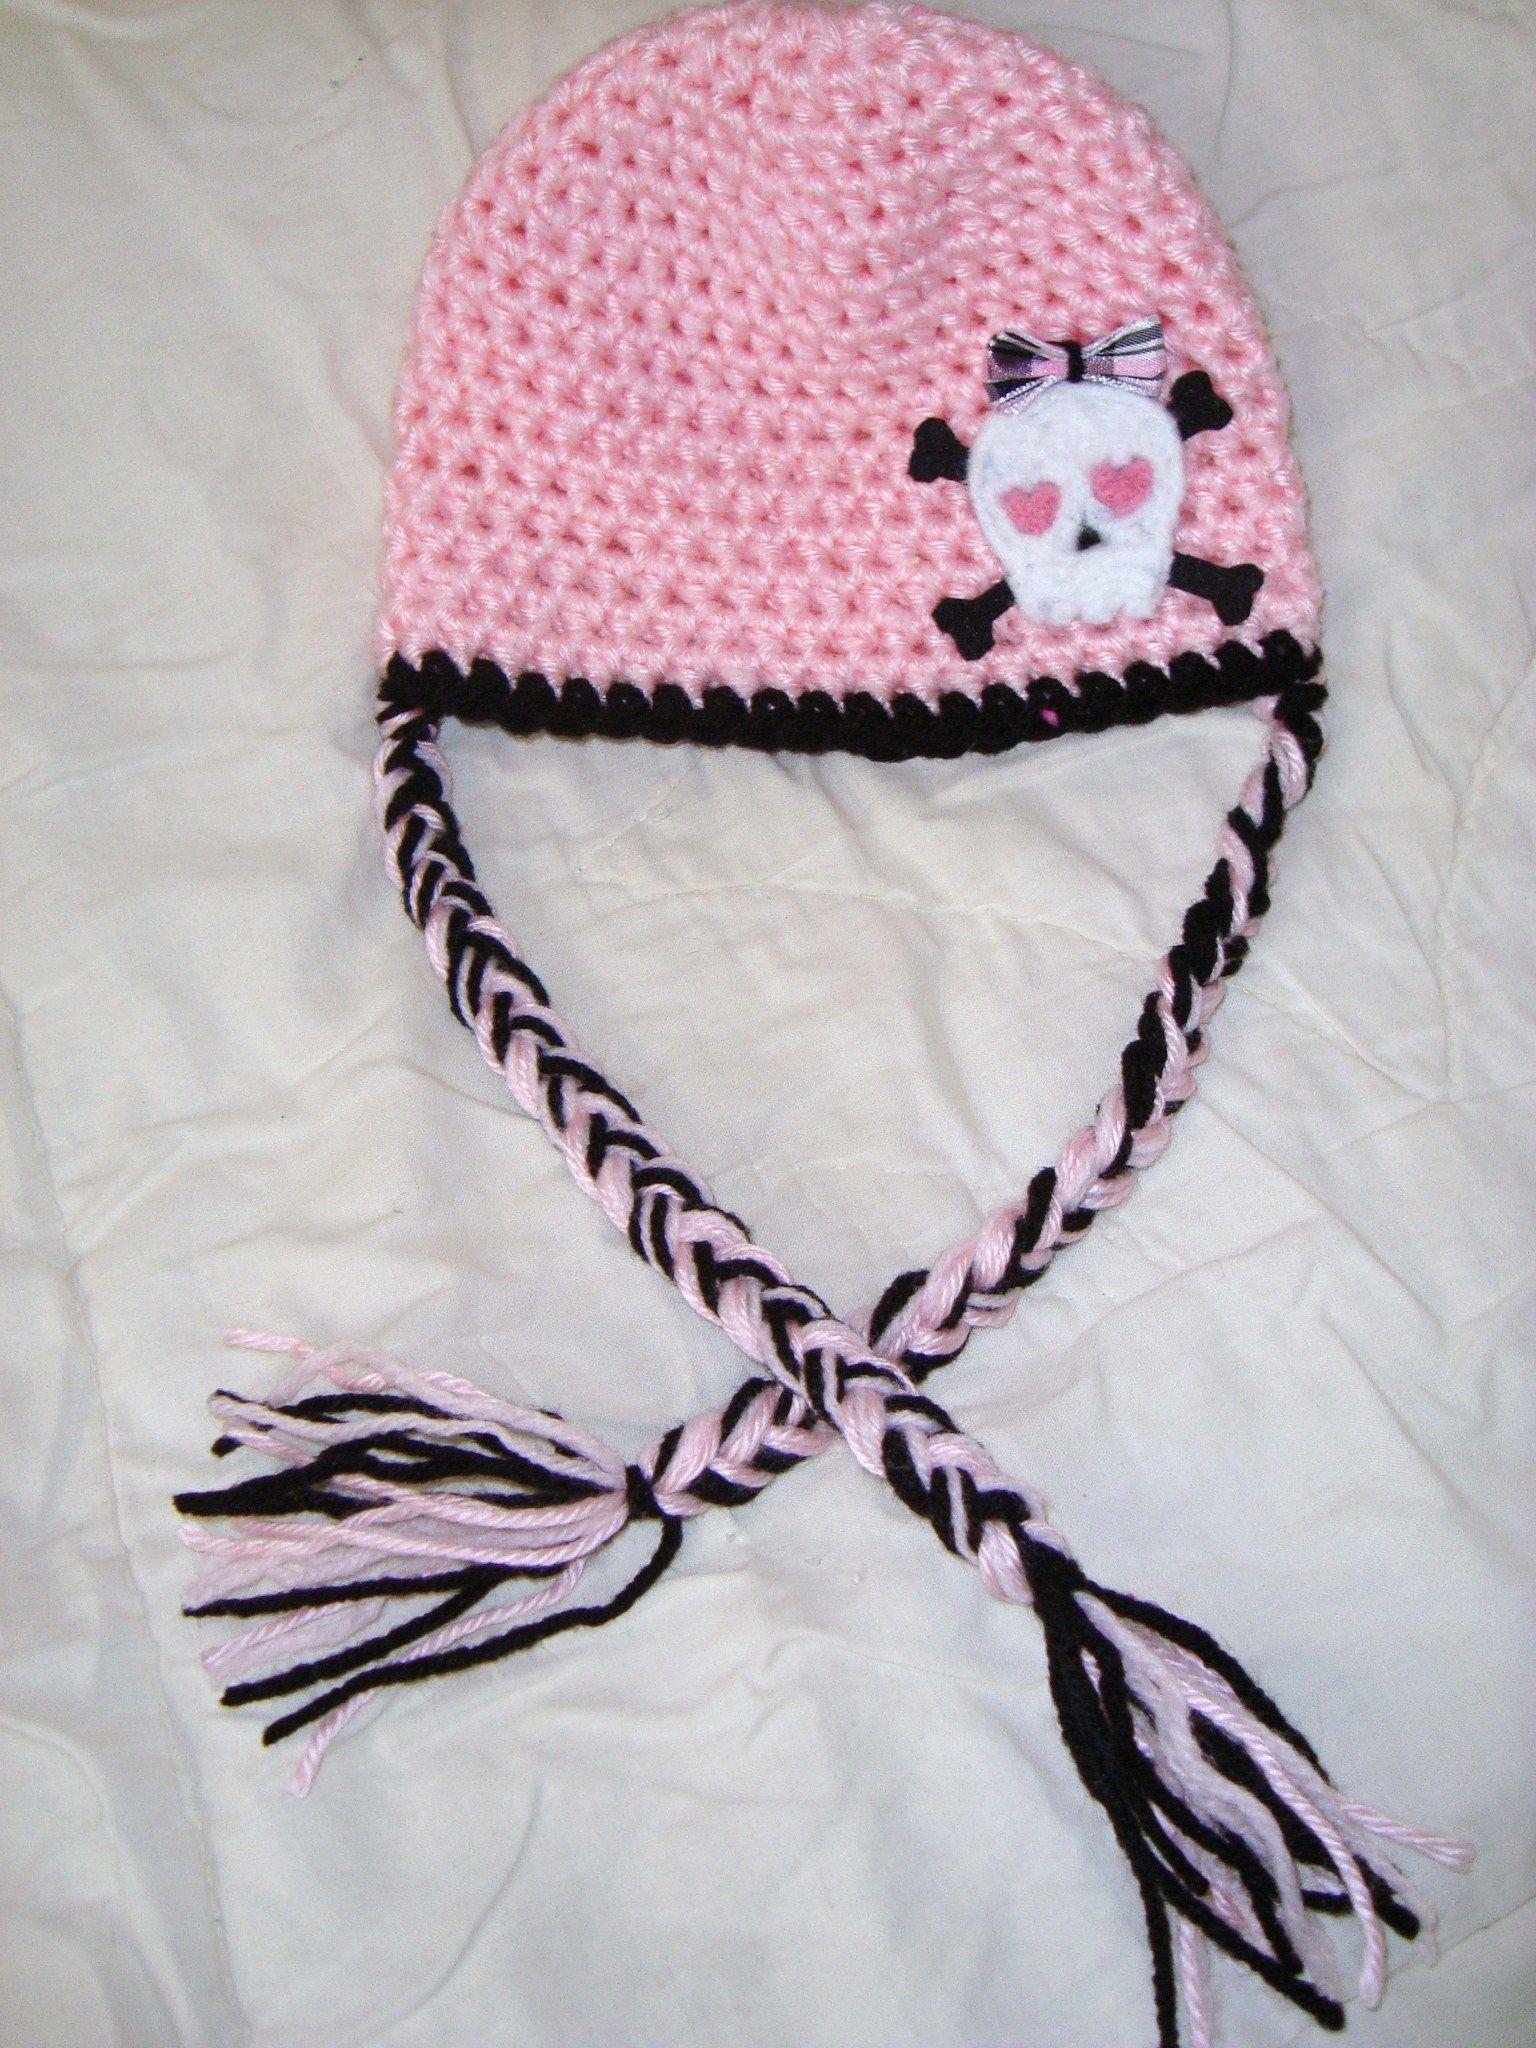 free hat crochet patterns from our free crochet patterns | Crochet ...